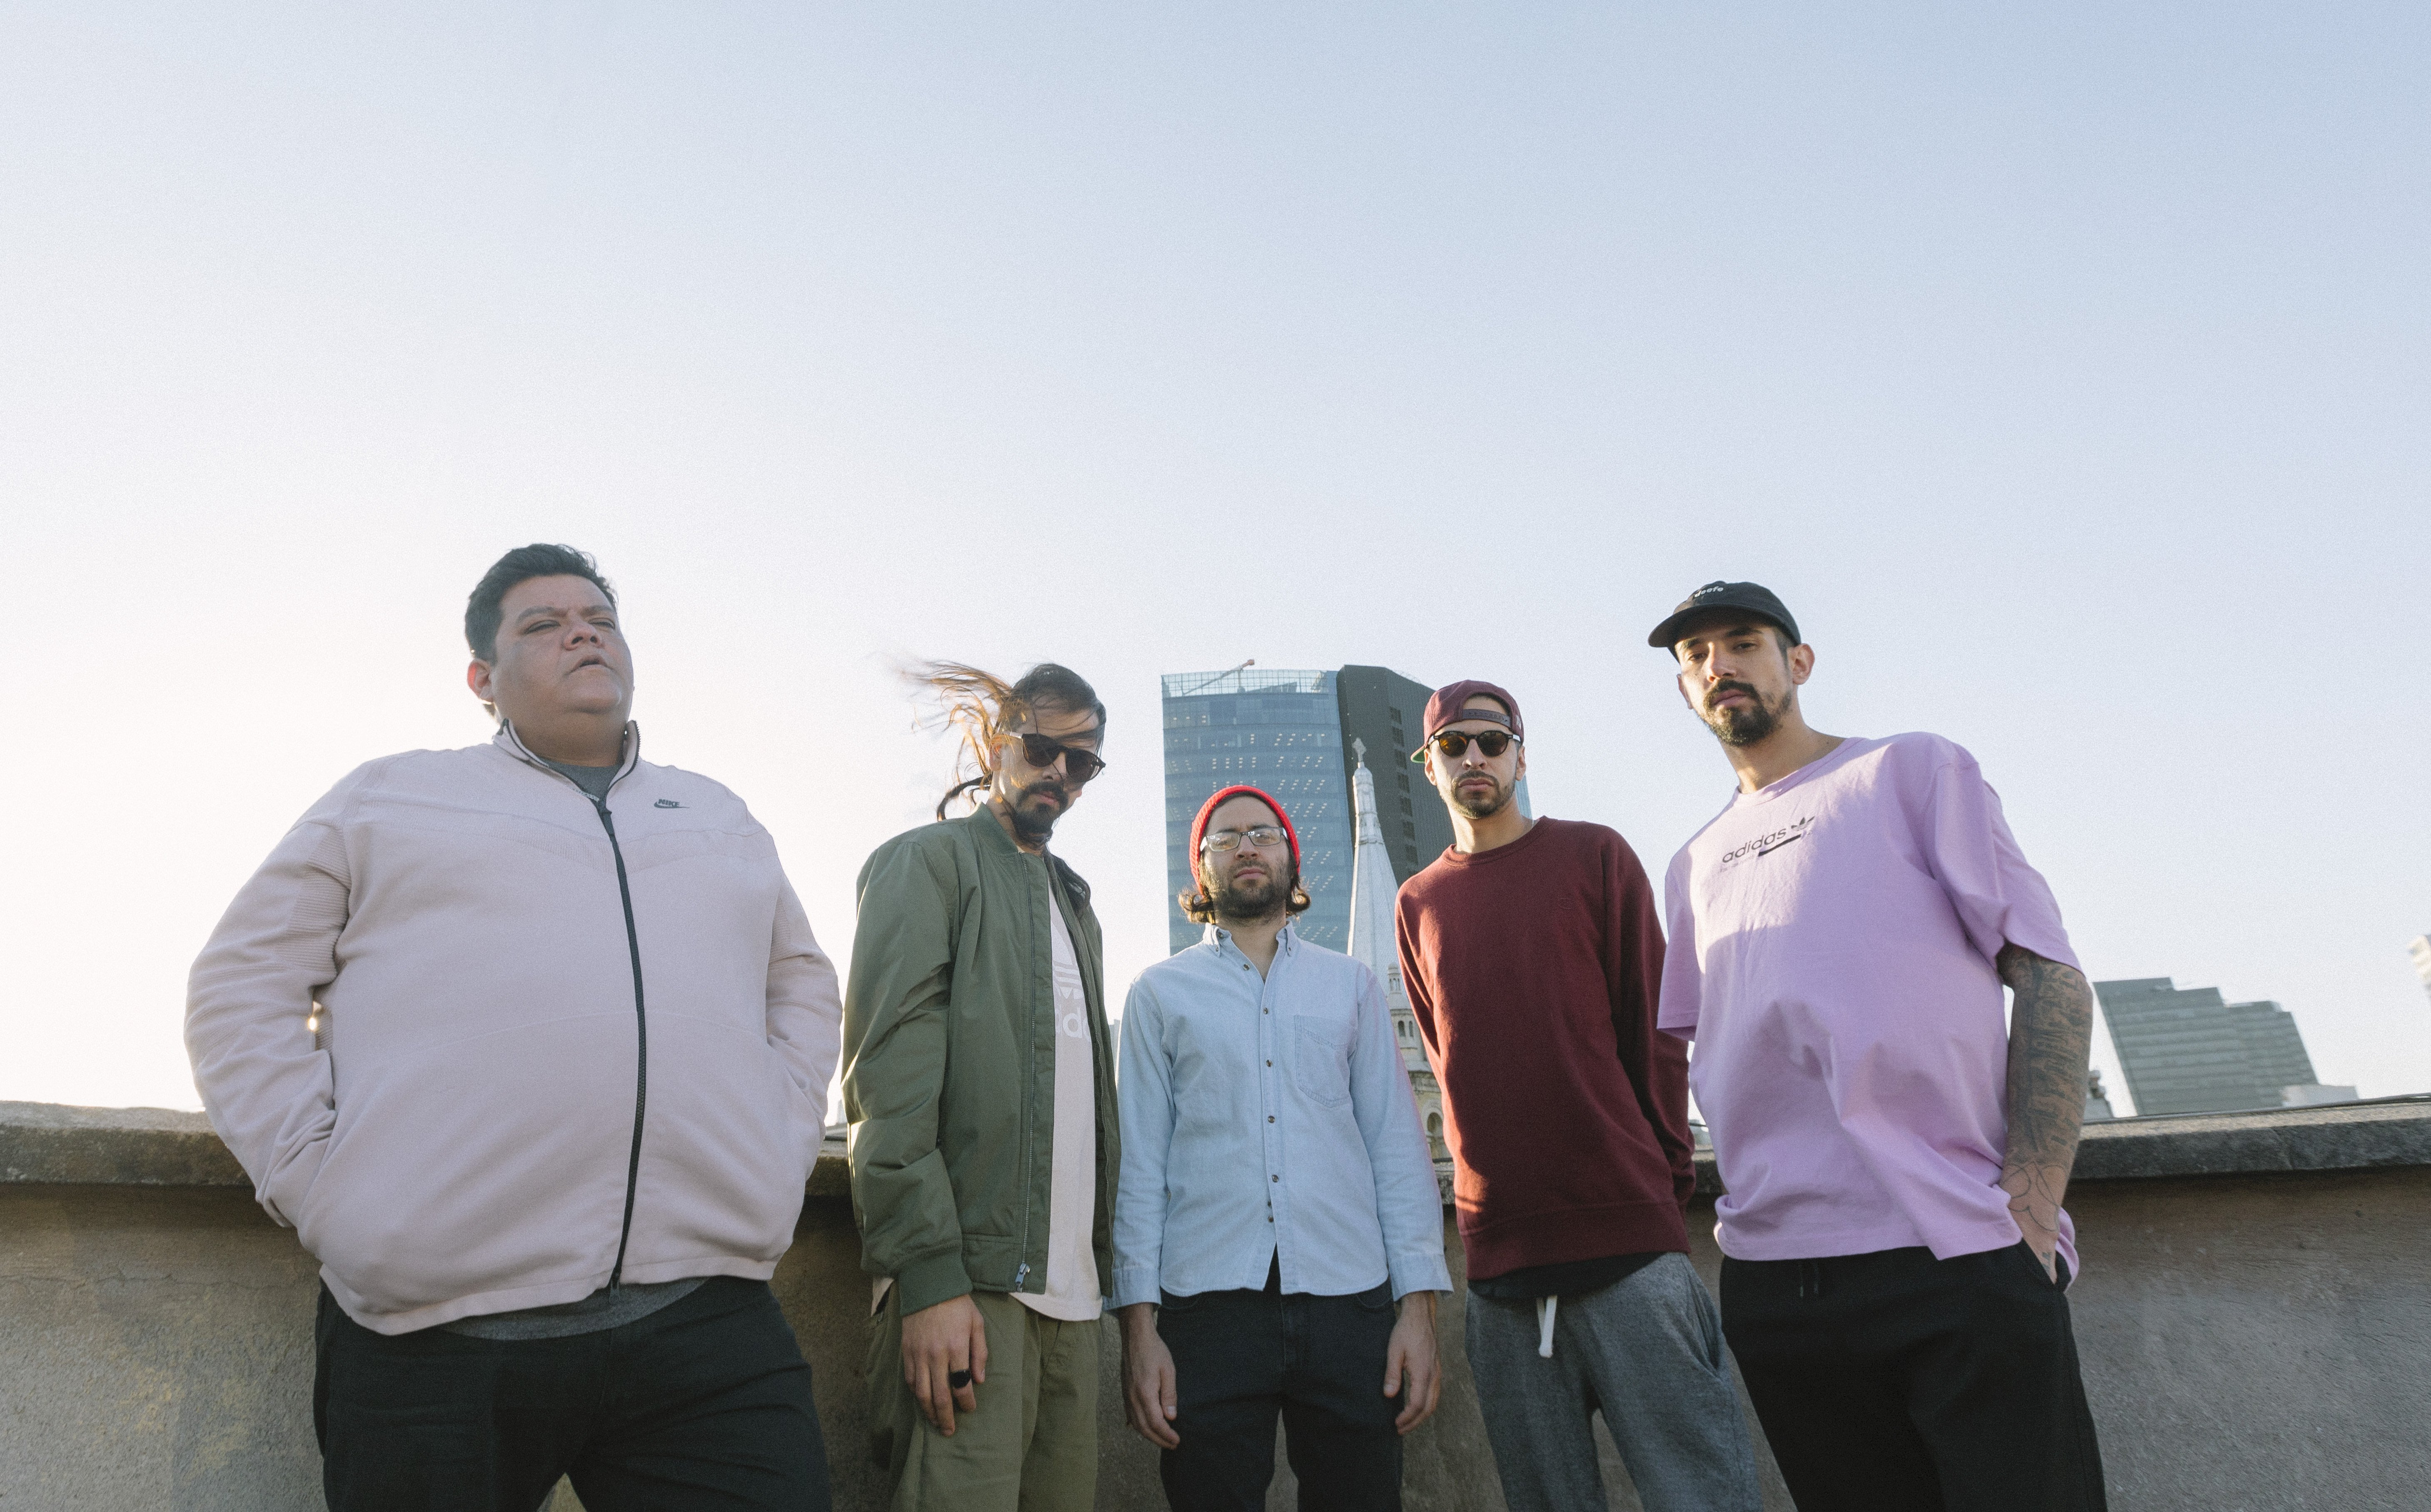 The Guadaloops: hip hop mexicano para un mundo feliz que no imaginó Aldous Huxley